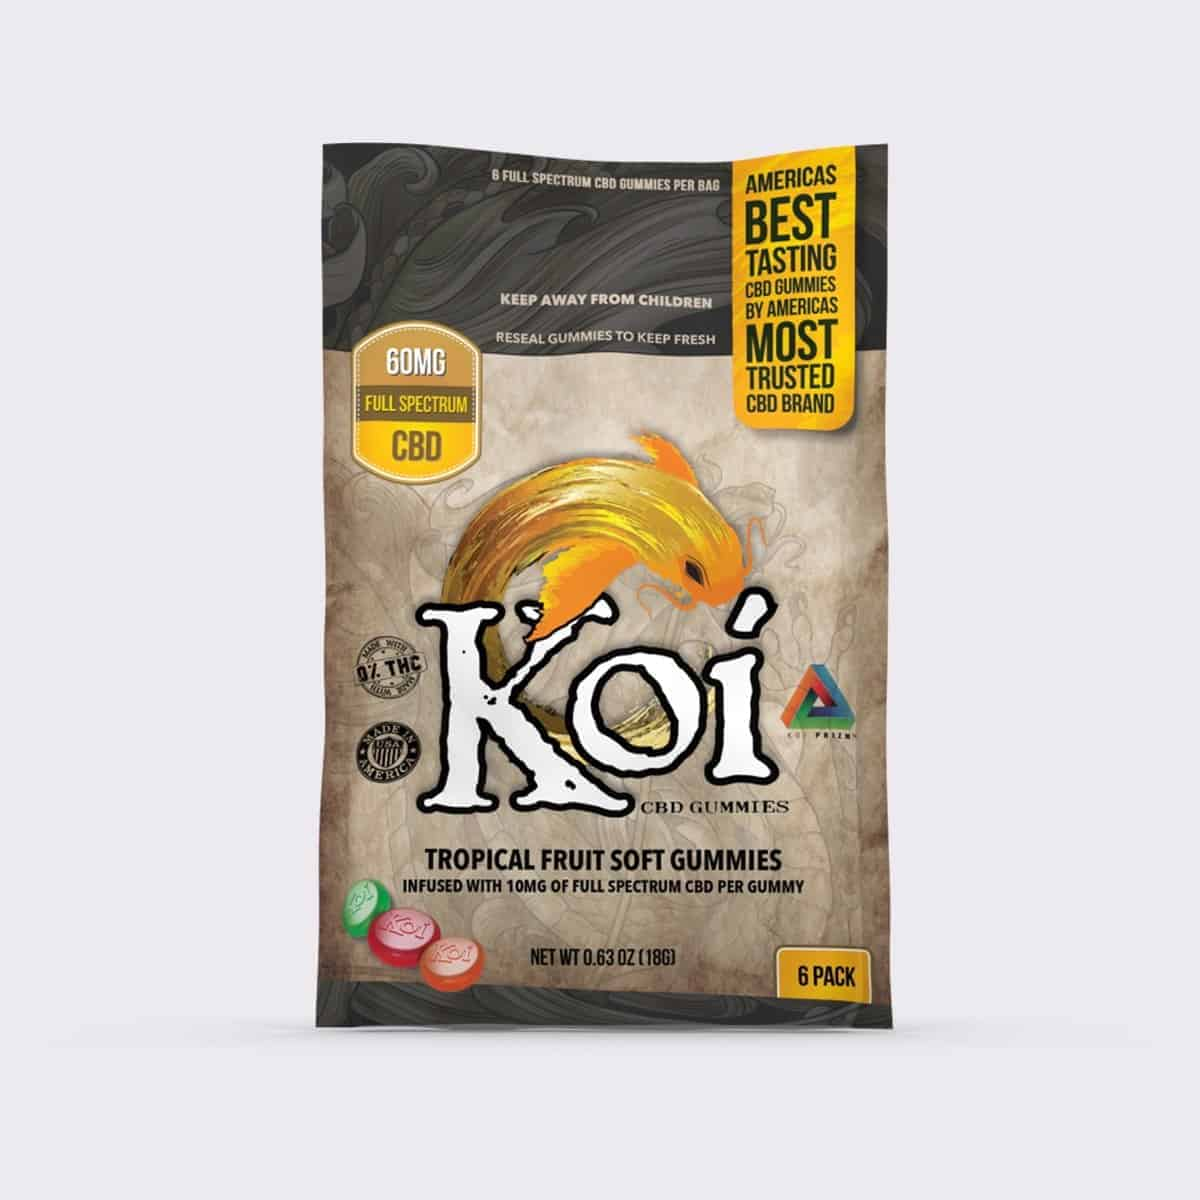 KOI CBD TROPICAL FRUIT SOFT GUMMIES